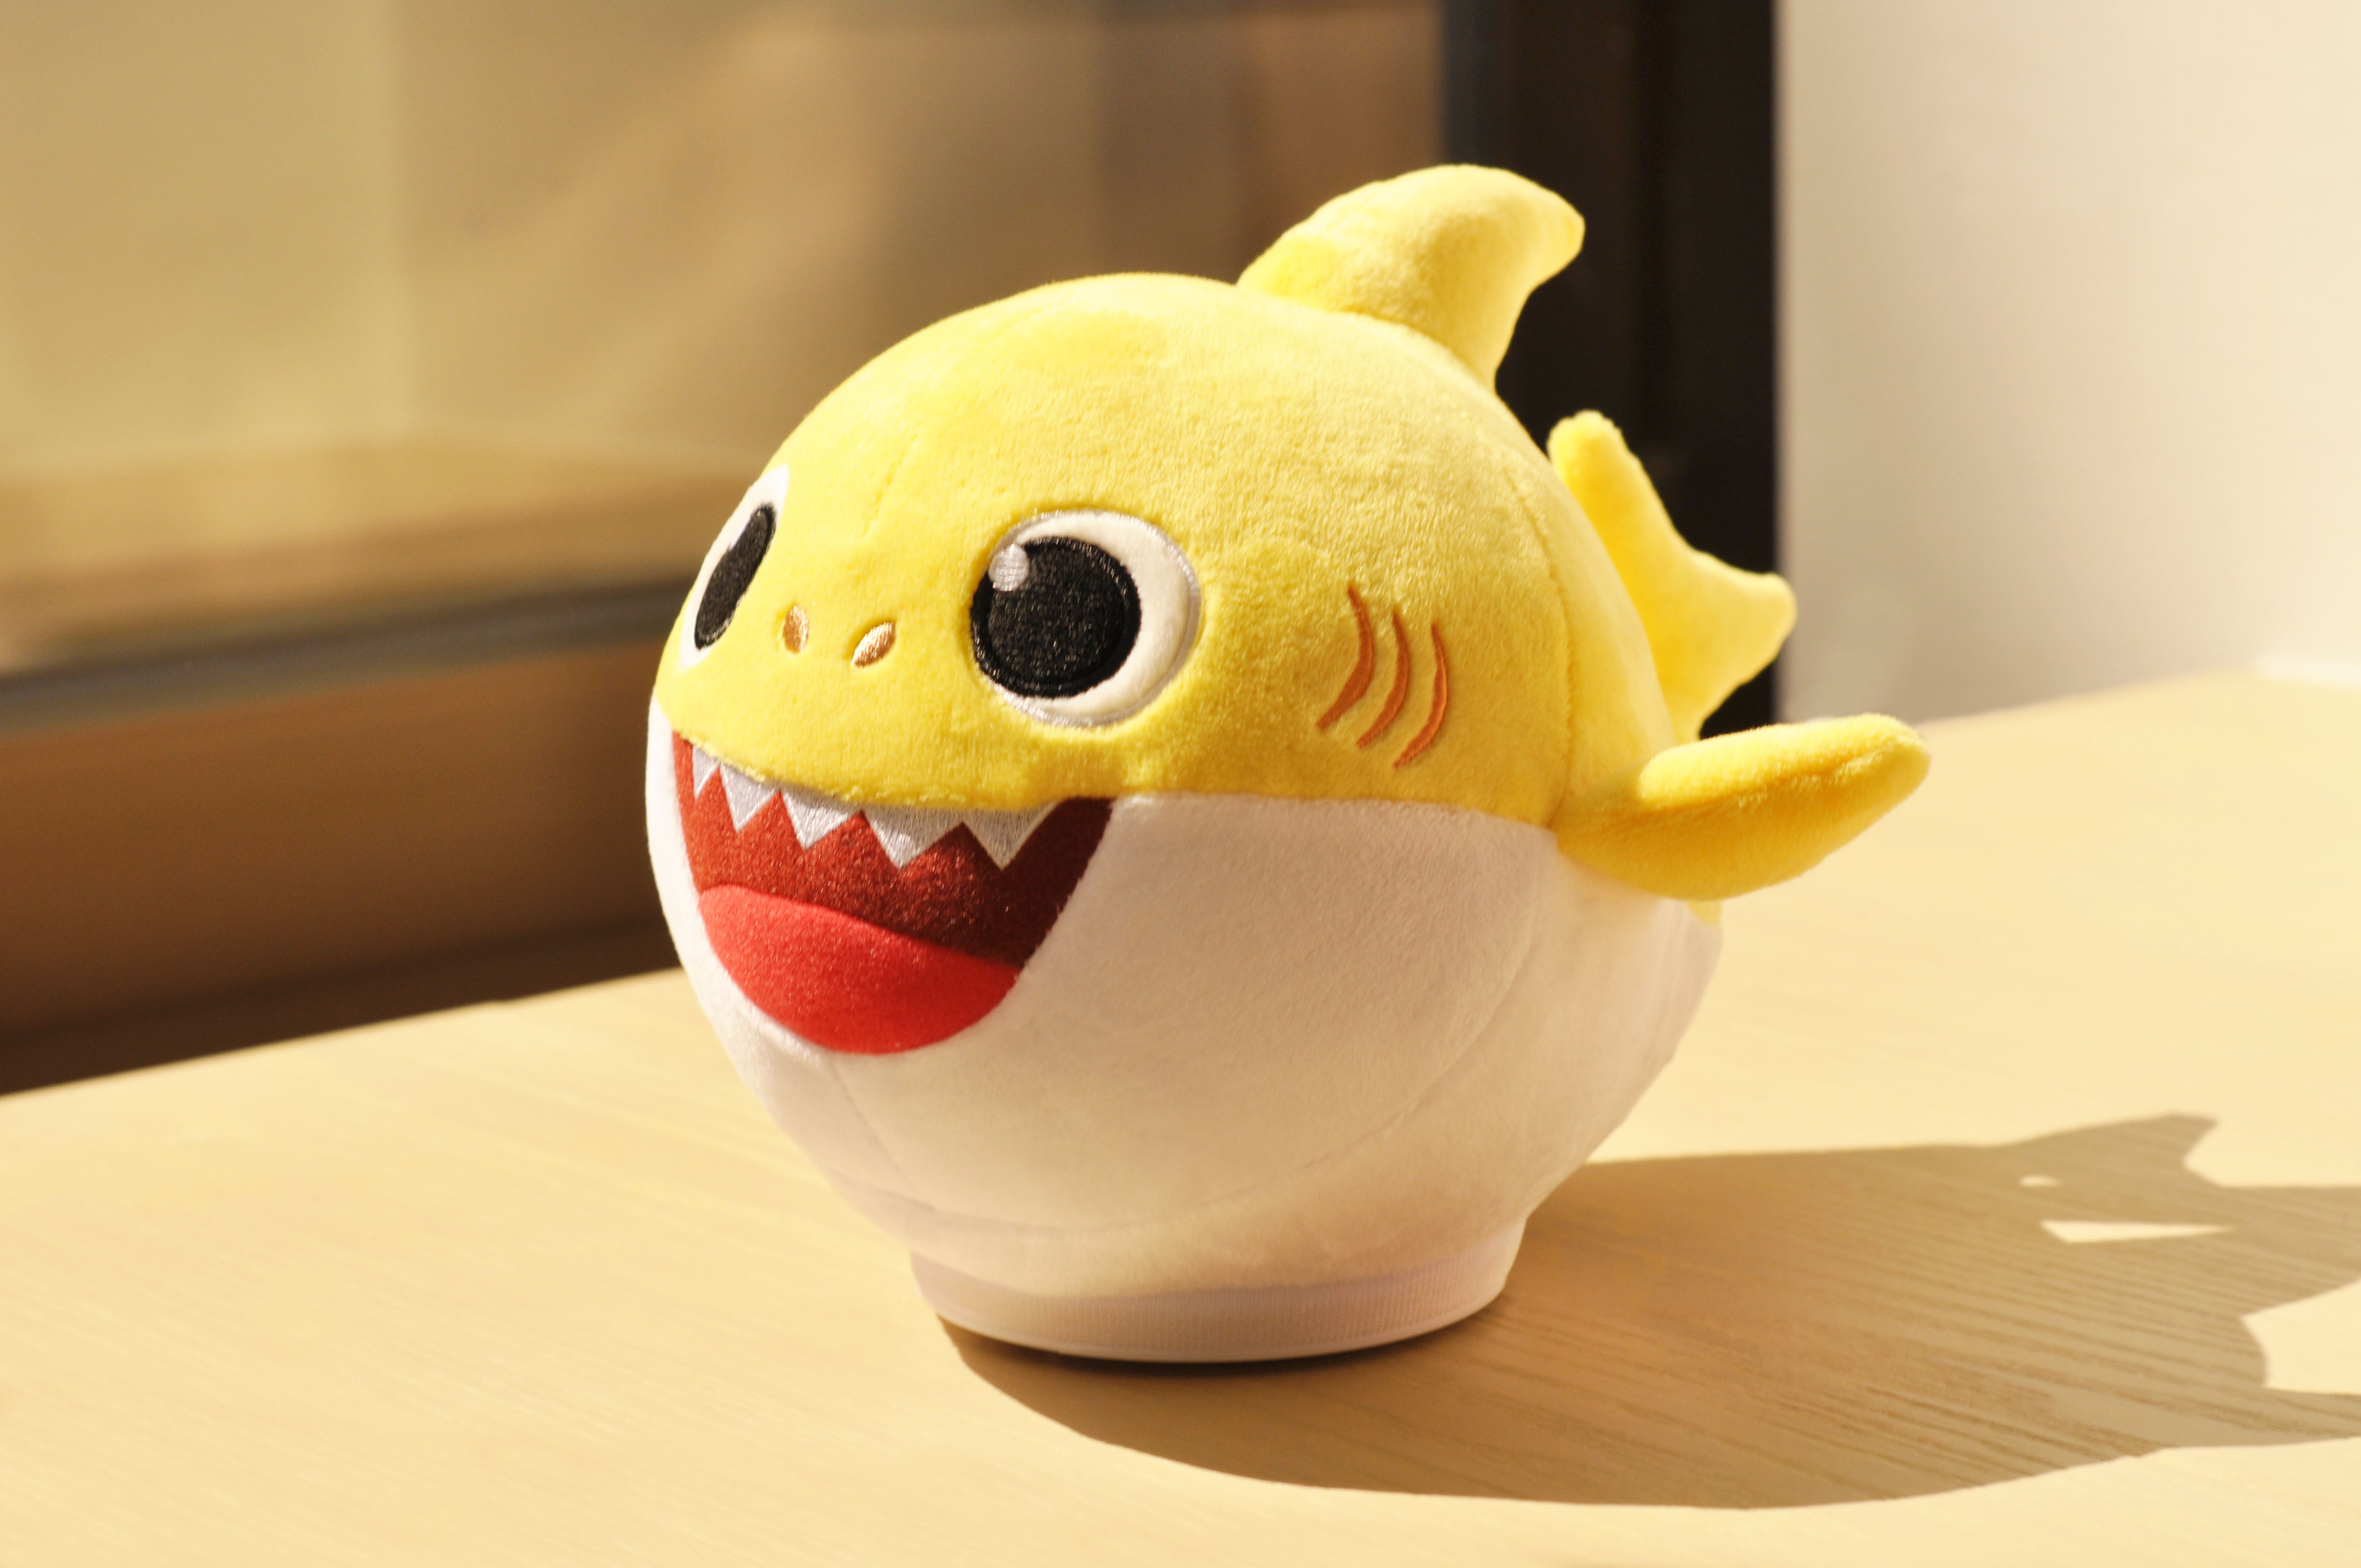 SS120510280000 Baby Shark Pinkfong Dancing Babyshark (4)